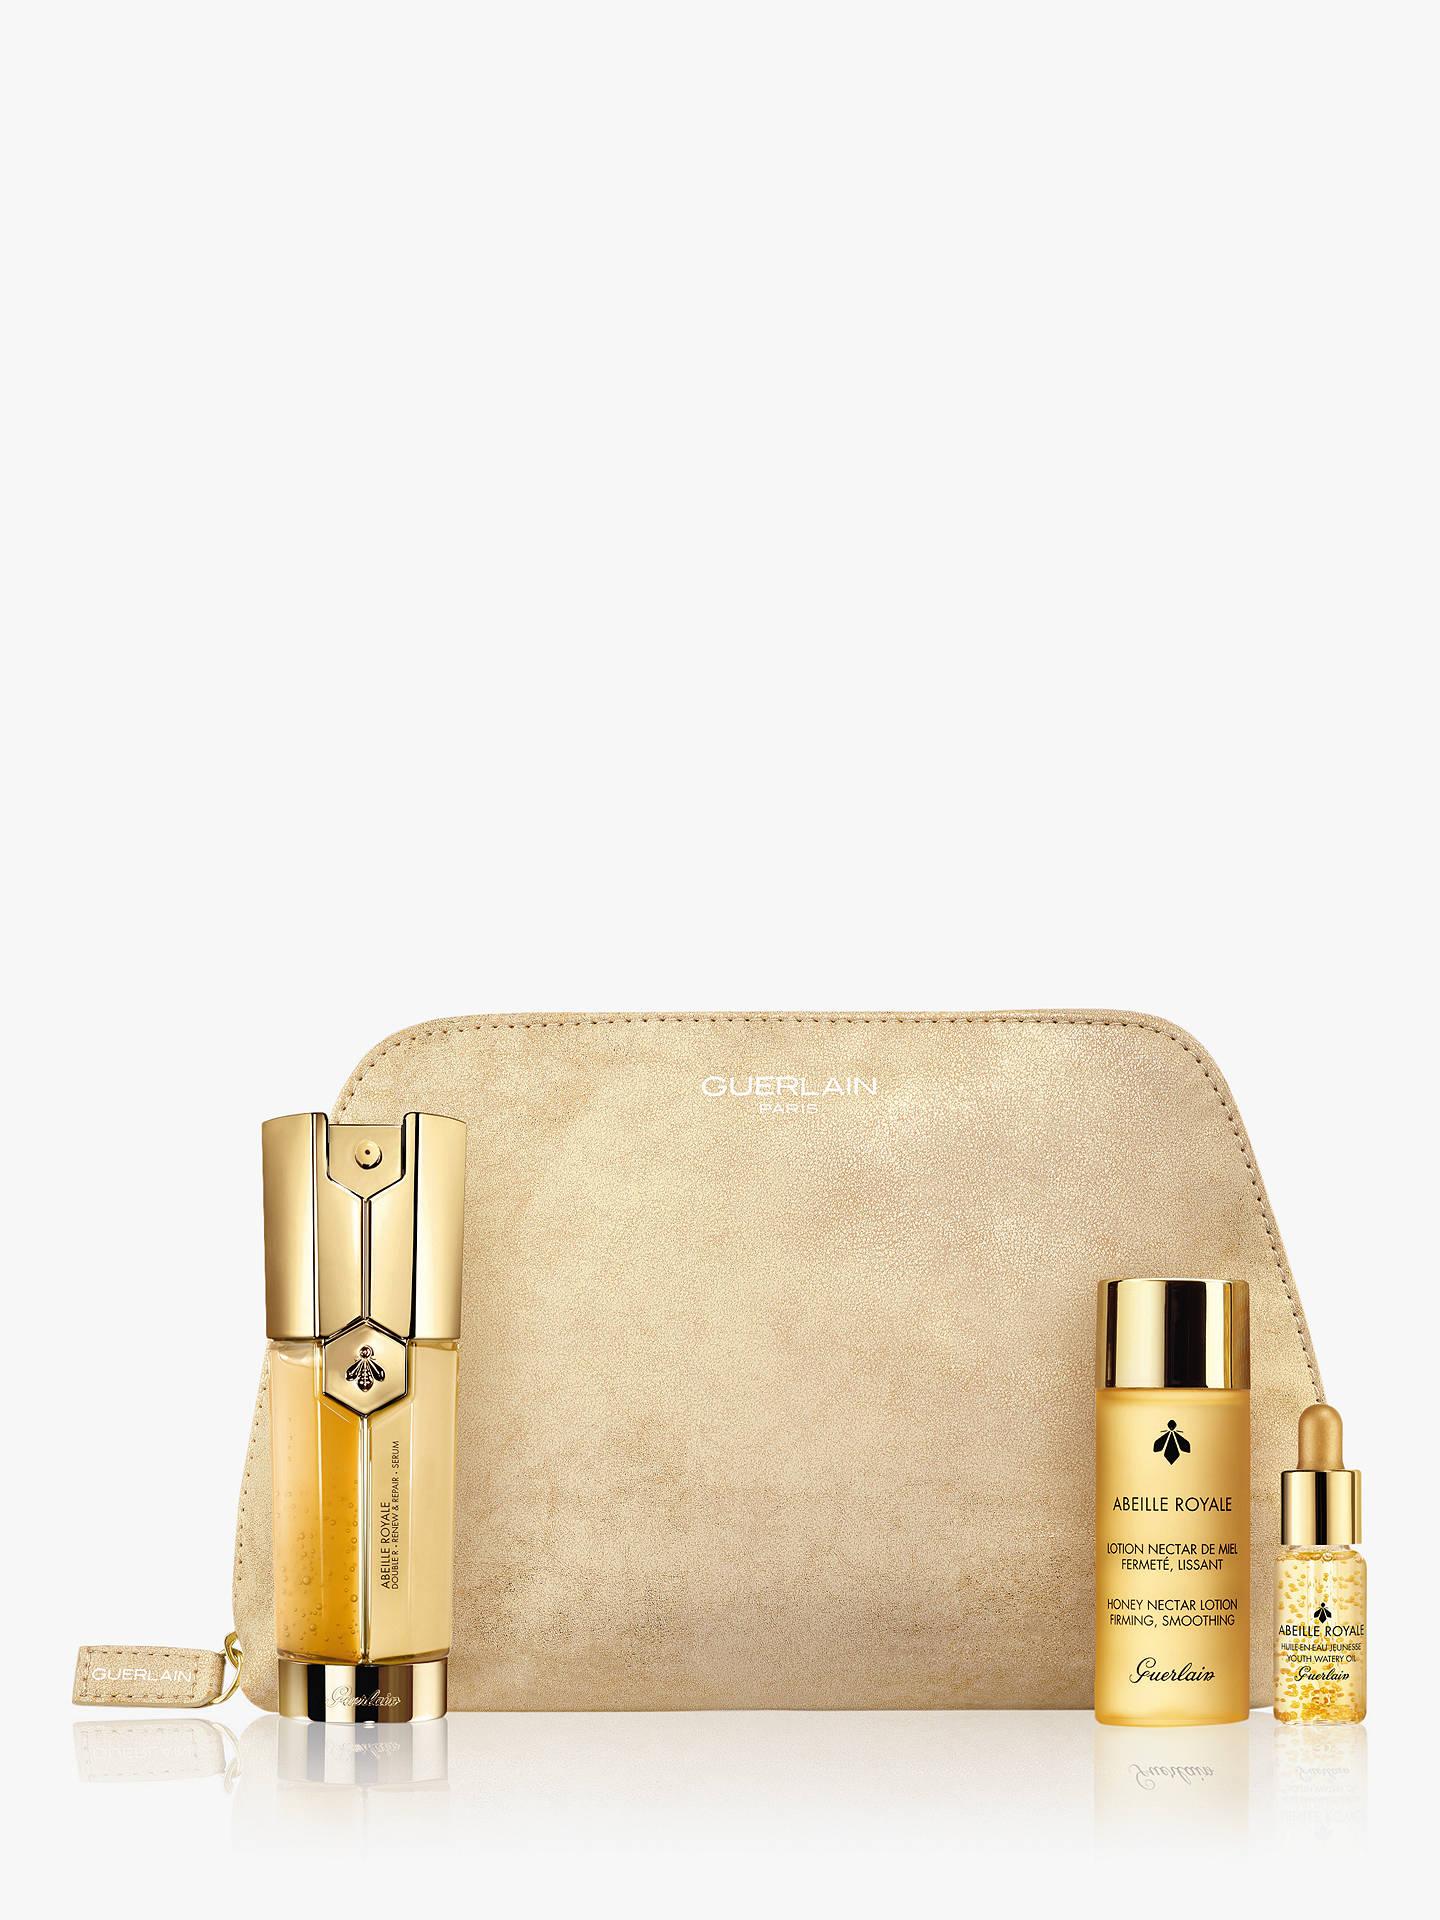 7bf0801649eea Buy Guerlain Abeille Royale Skincare Gift Set Online at johnlewis.com